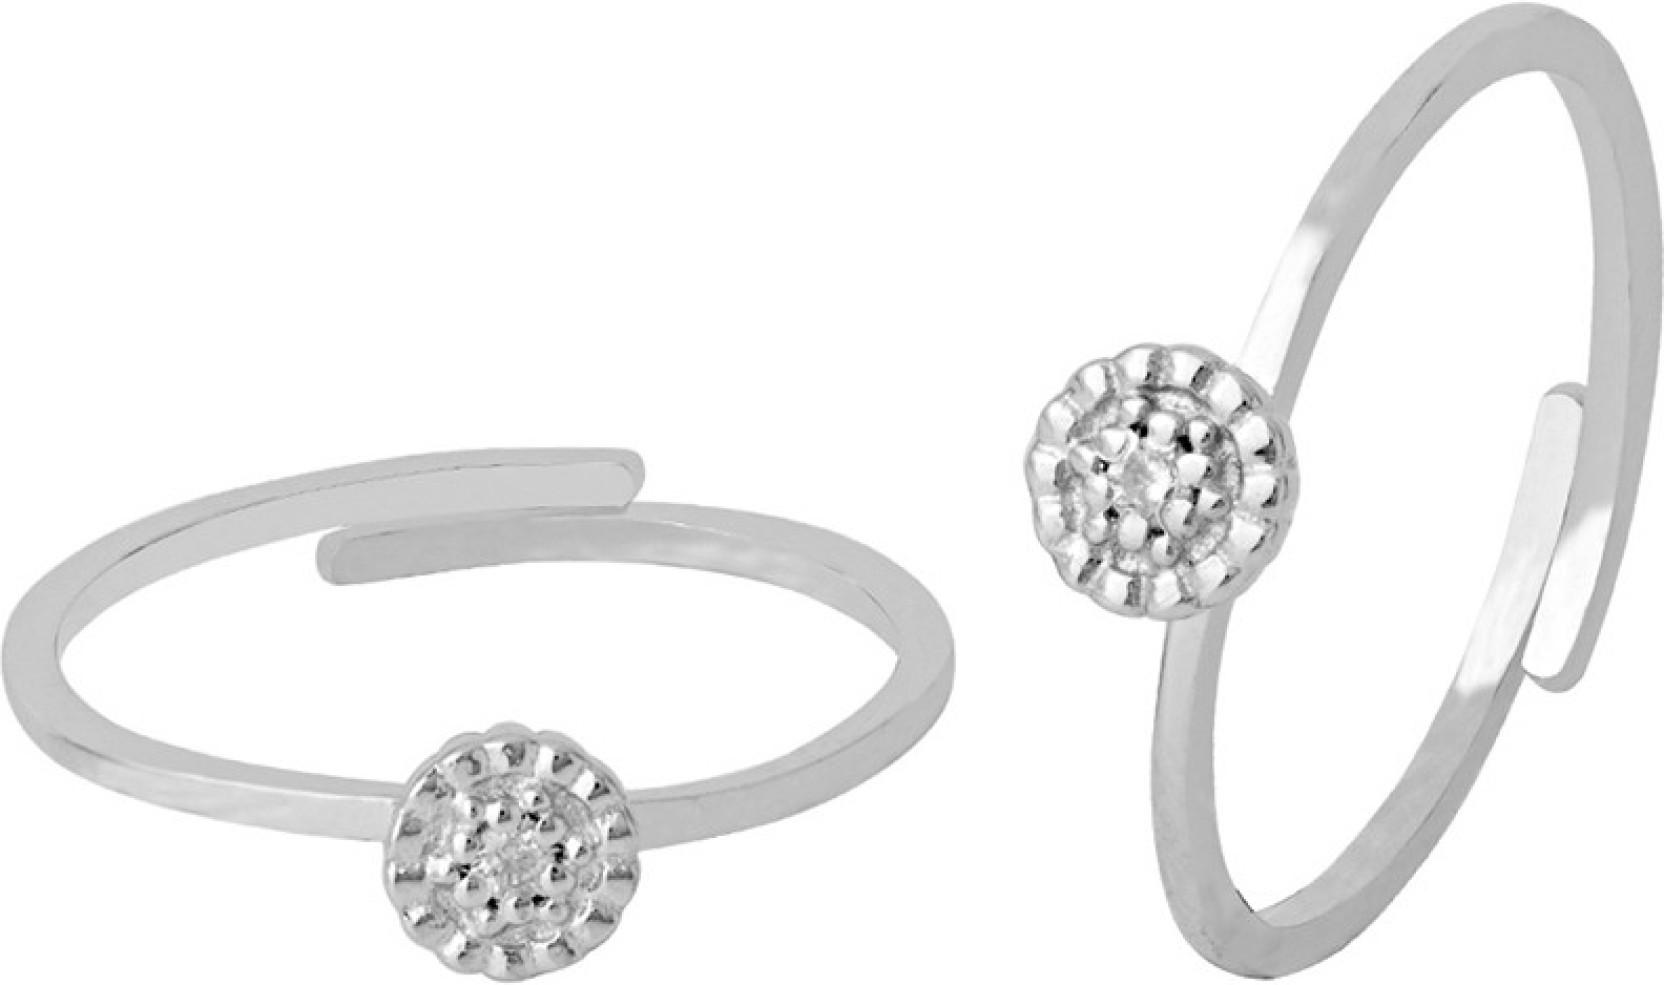 28703d93e3c21 Voylla 925 Sterling Silver Toe Rings For Women Sterling Silver Swarovski  Zirconia Rhodium Plated Toe Ring. Home